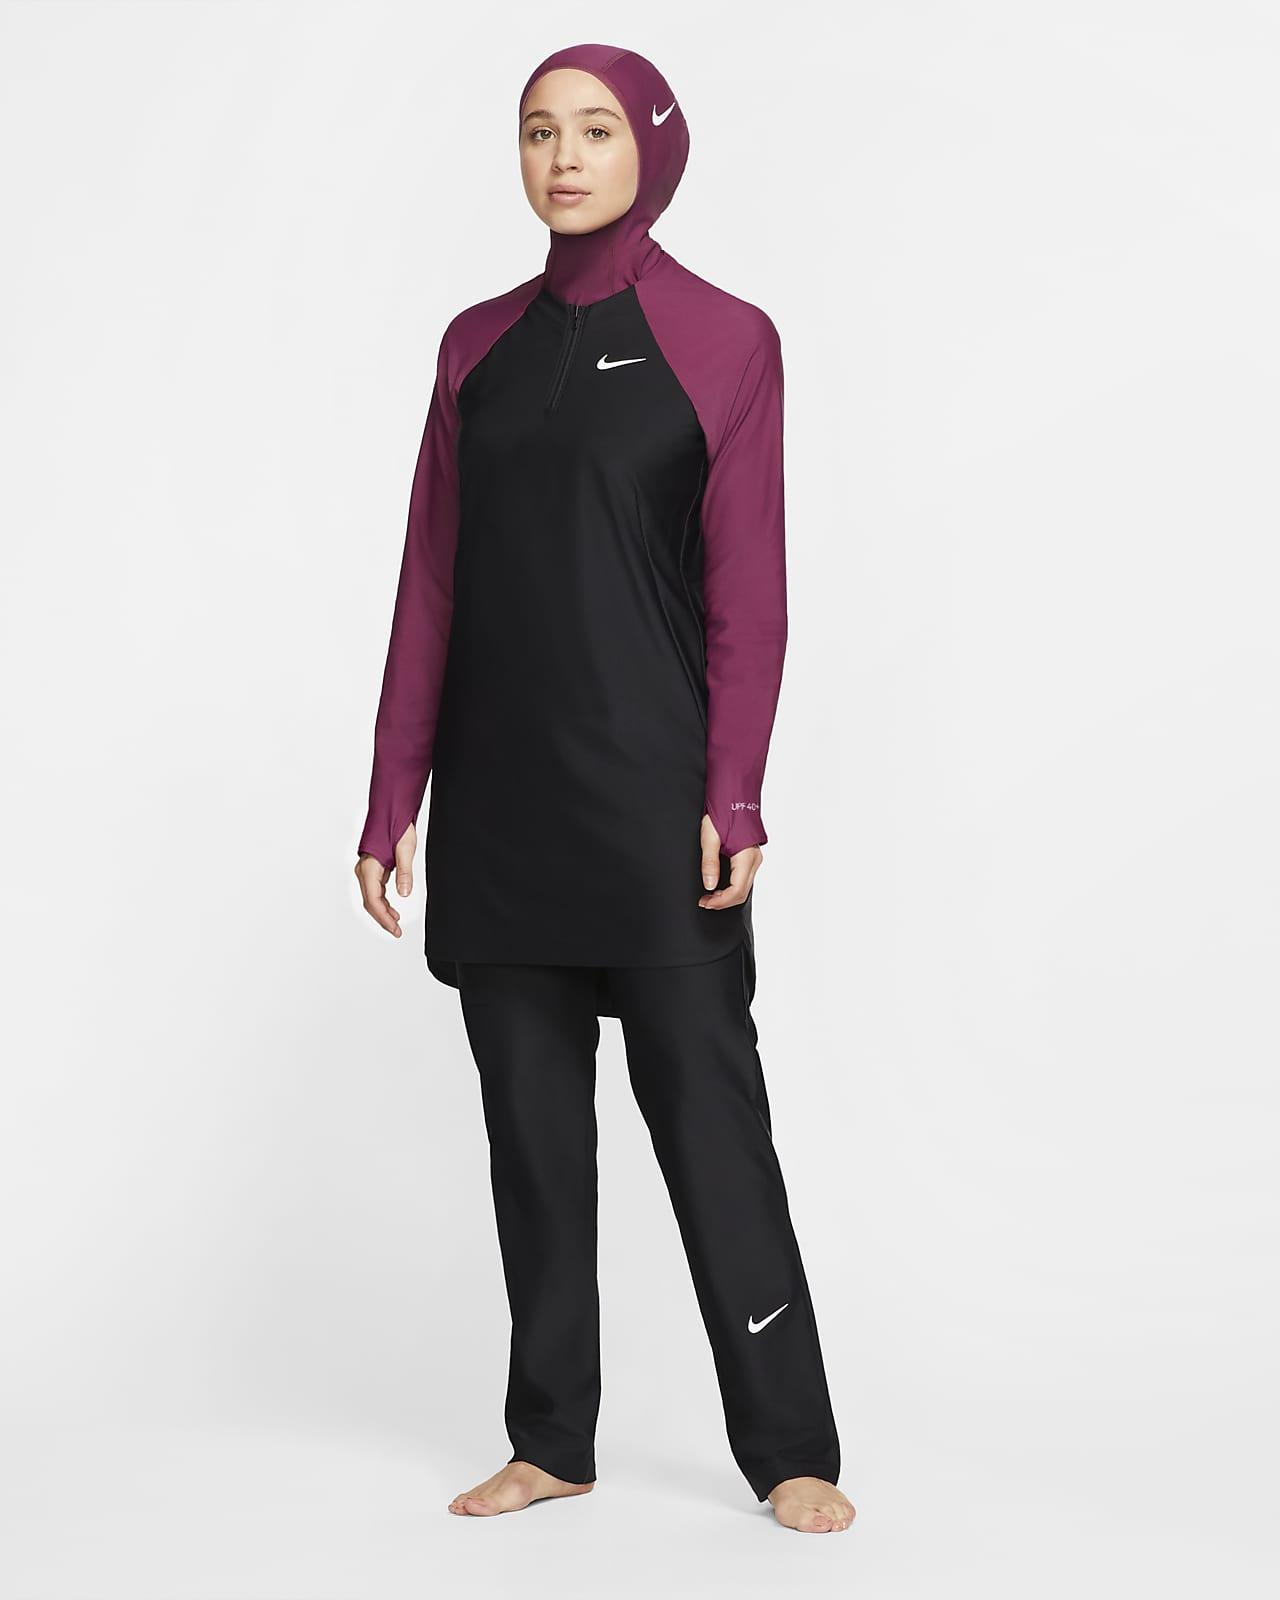 Nike Victory Women's Full-Coverage Straight-Leg Swim Pants